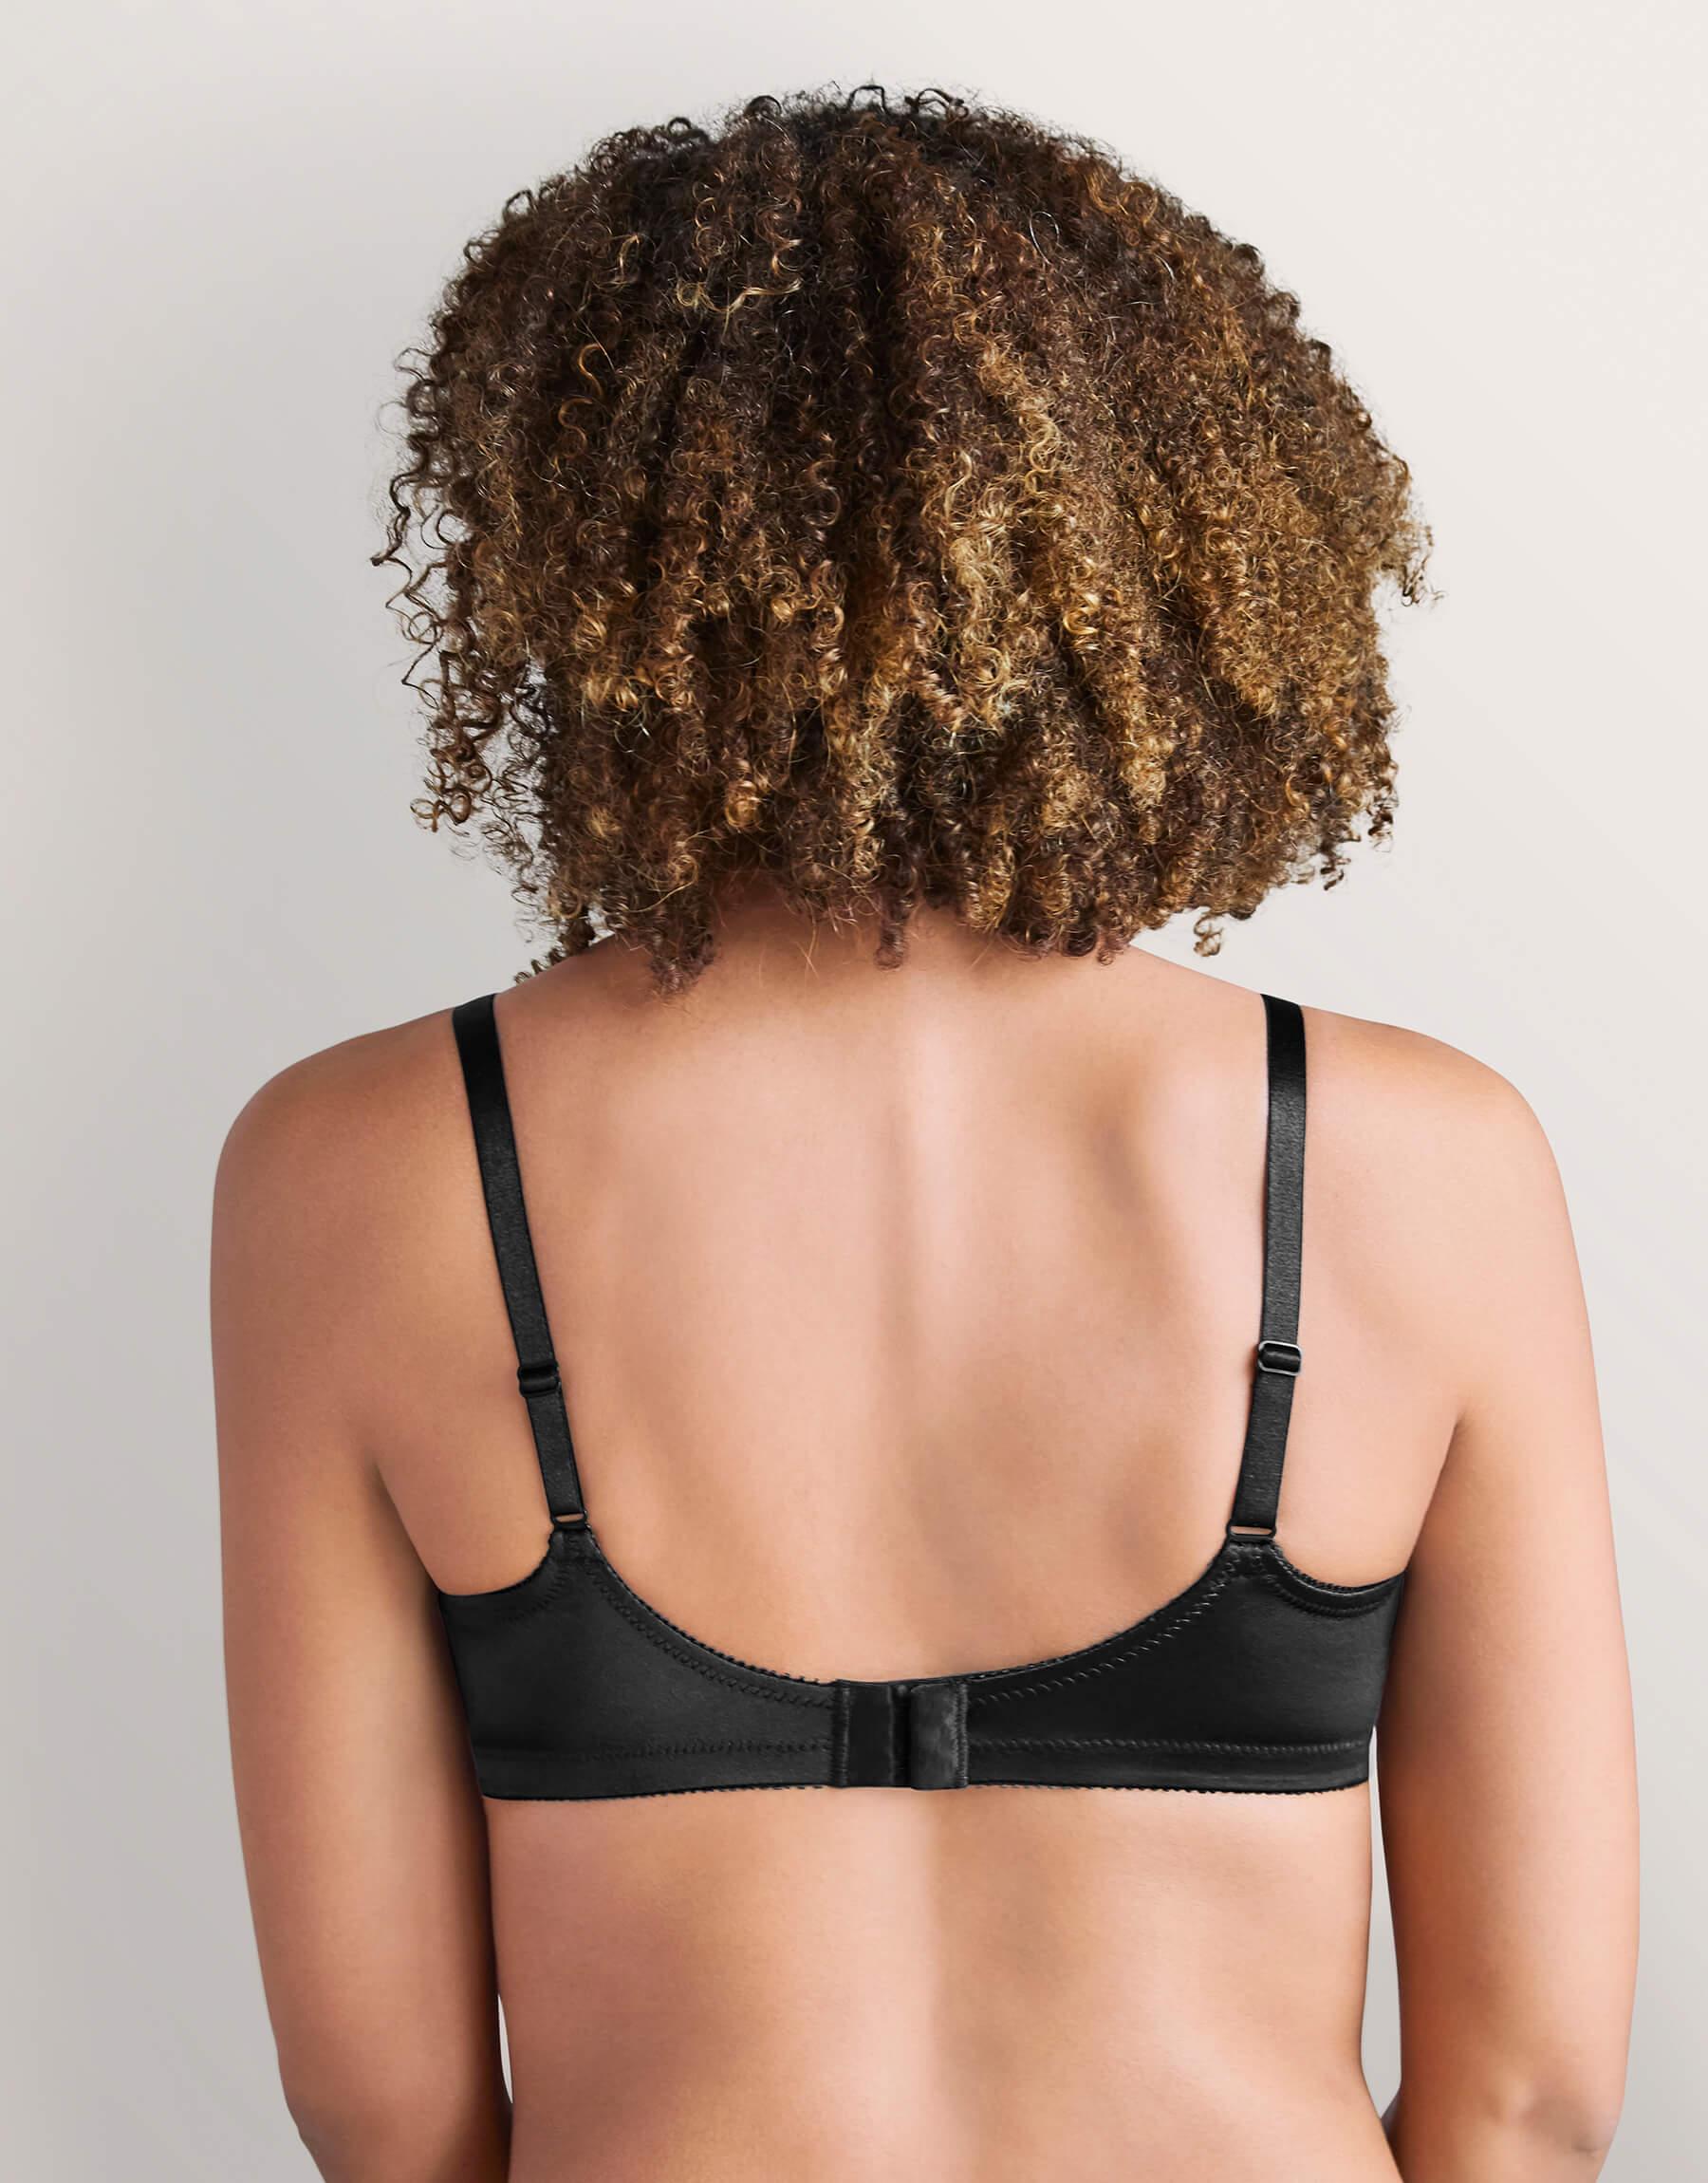 Isabel_SB_black bra2